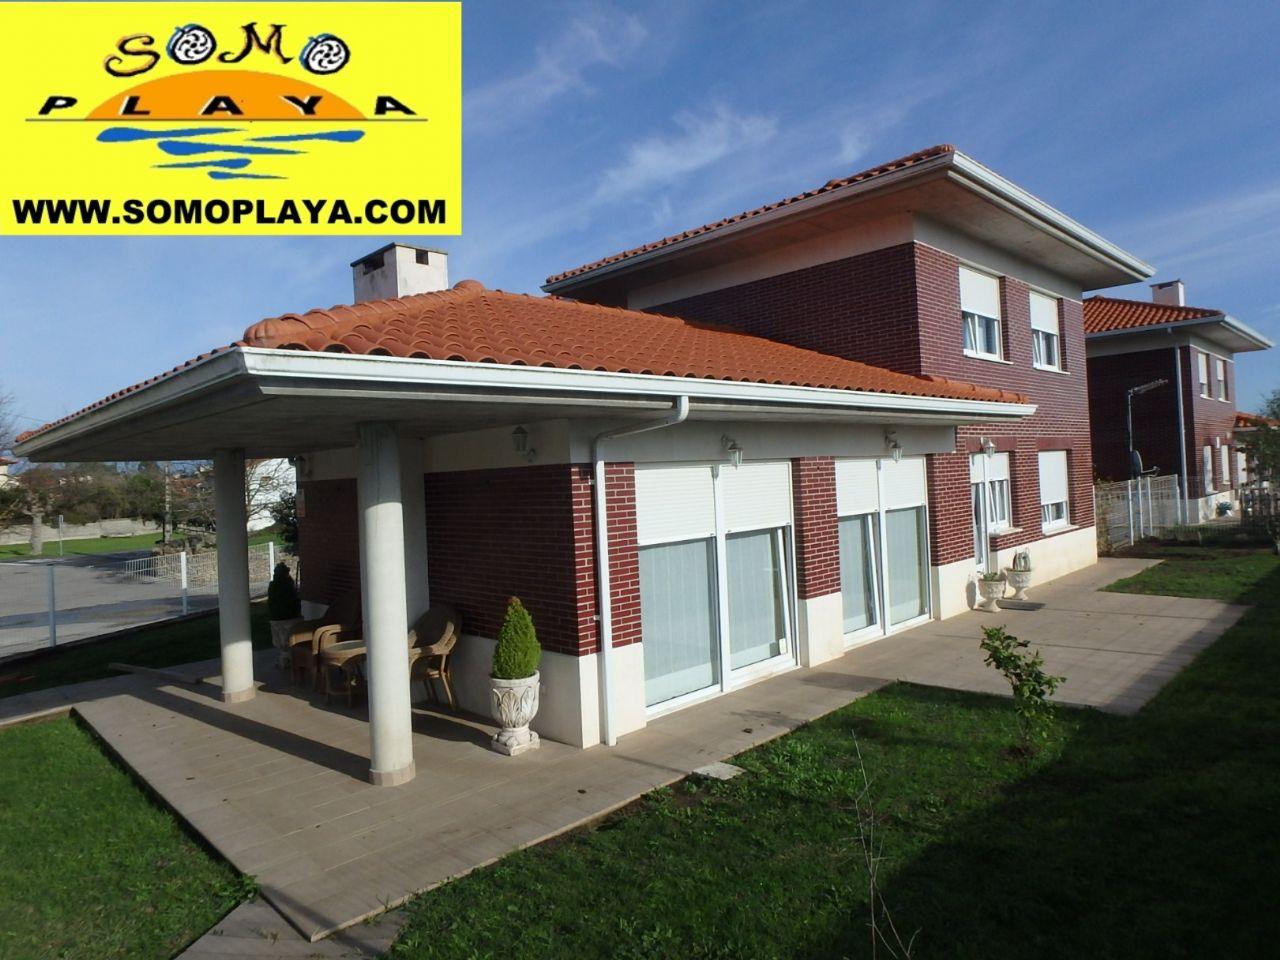 Casa / Chalet en Somo, Somo, venta